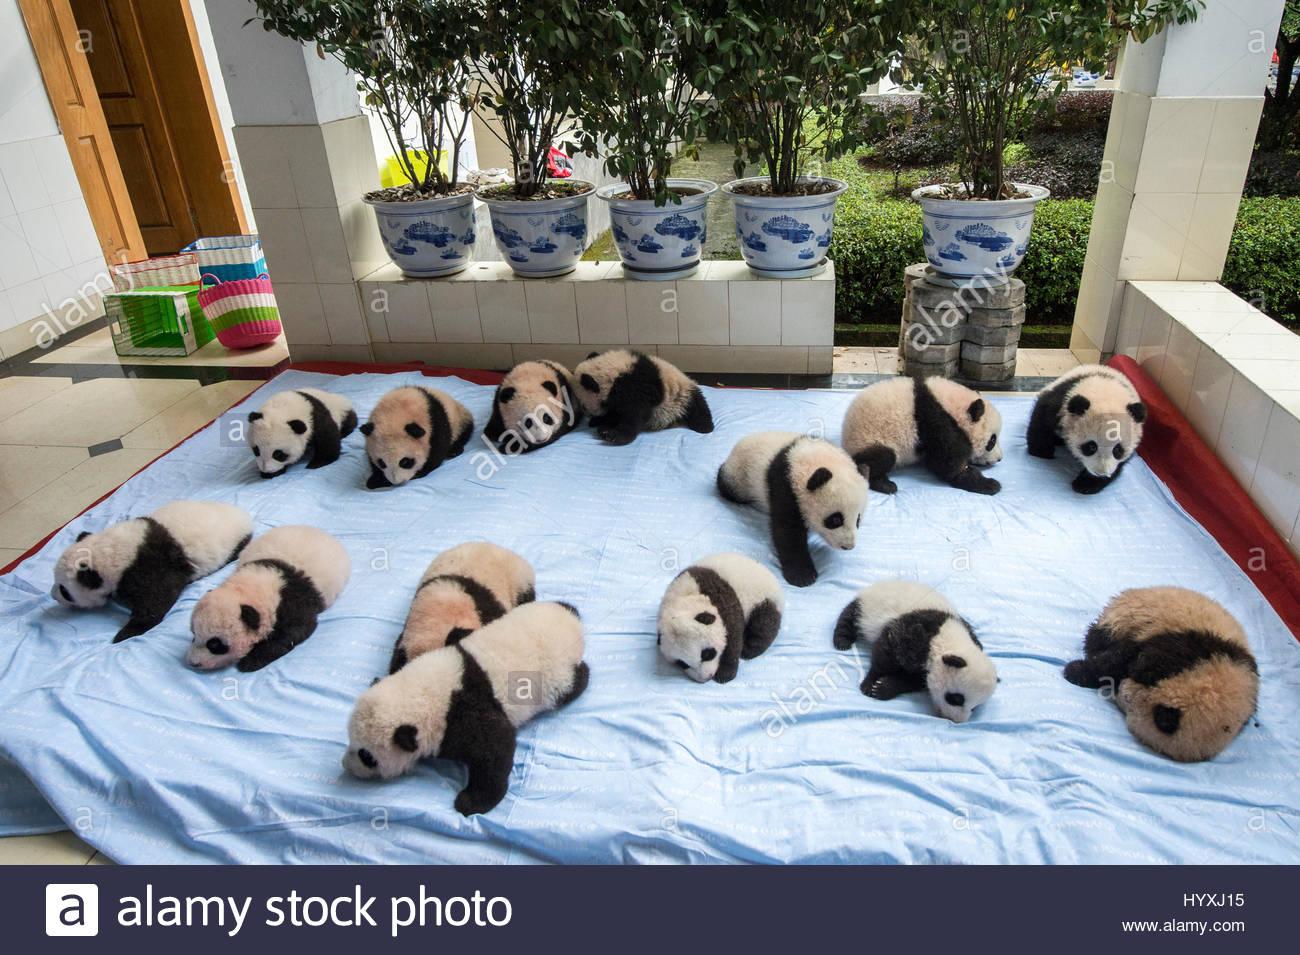 Fourteen baby captive-bred giant pandas on a blanket at the Bifengxia Panda Base giant panda breeding center. - Stock Image